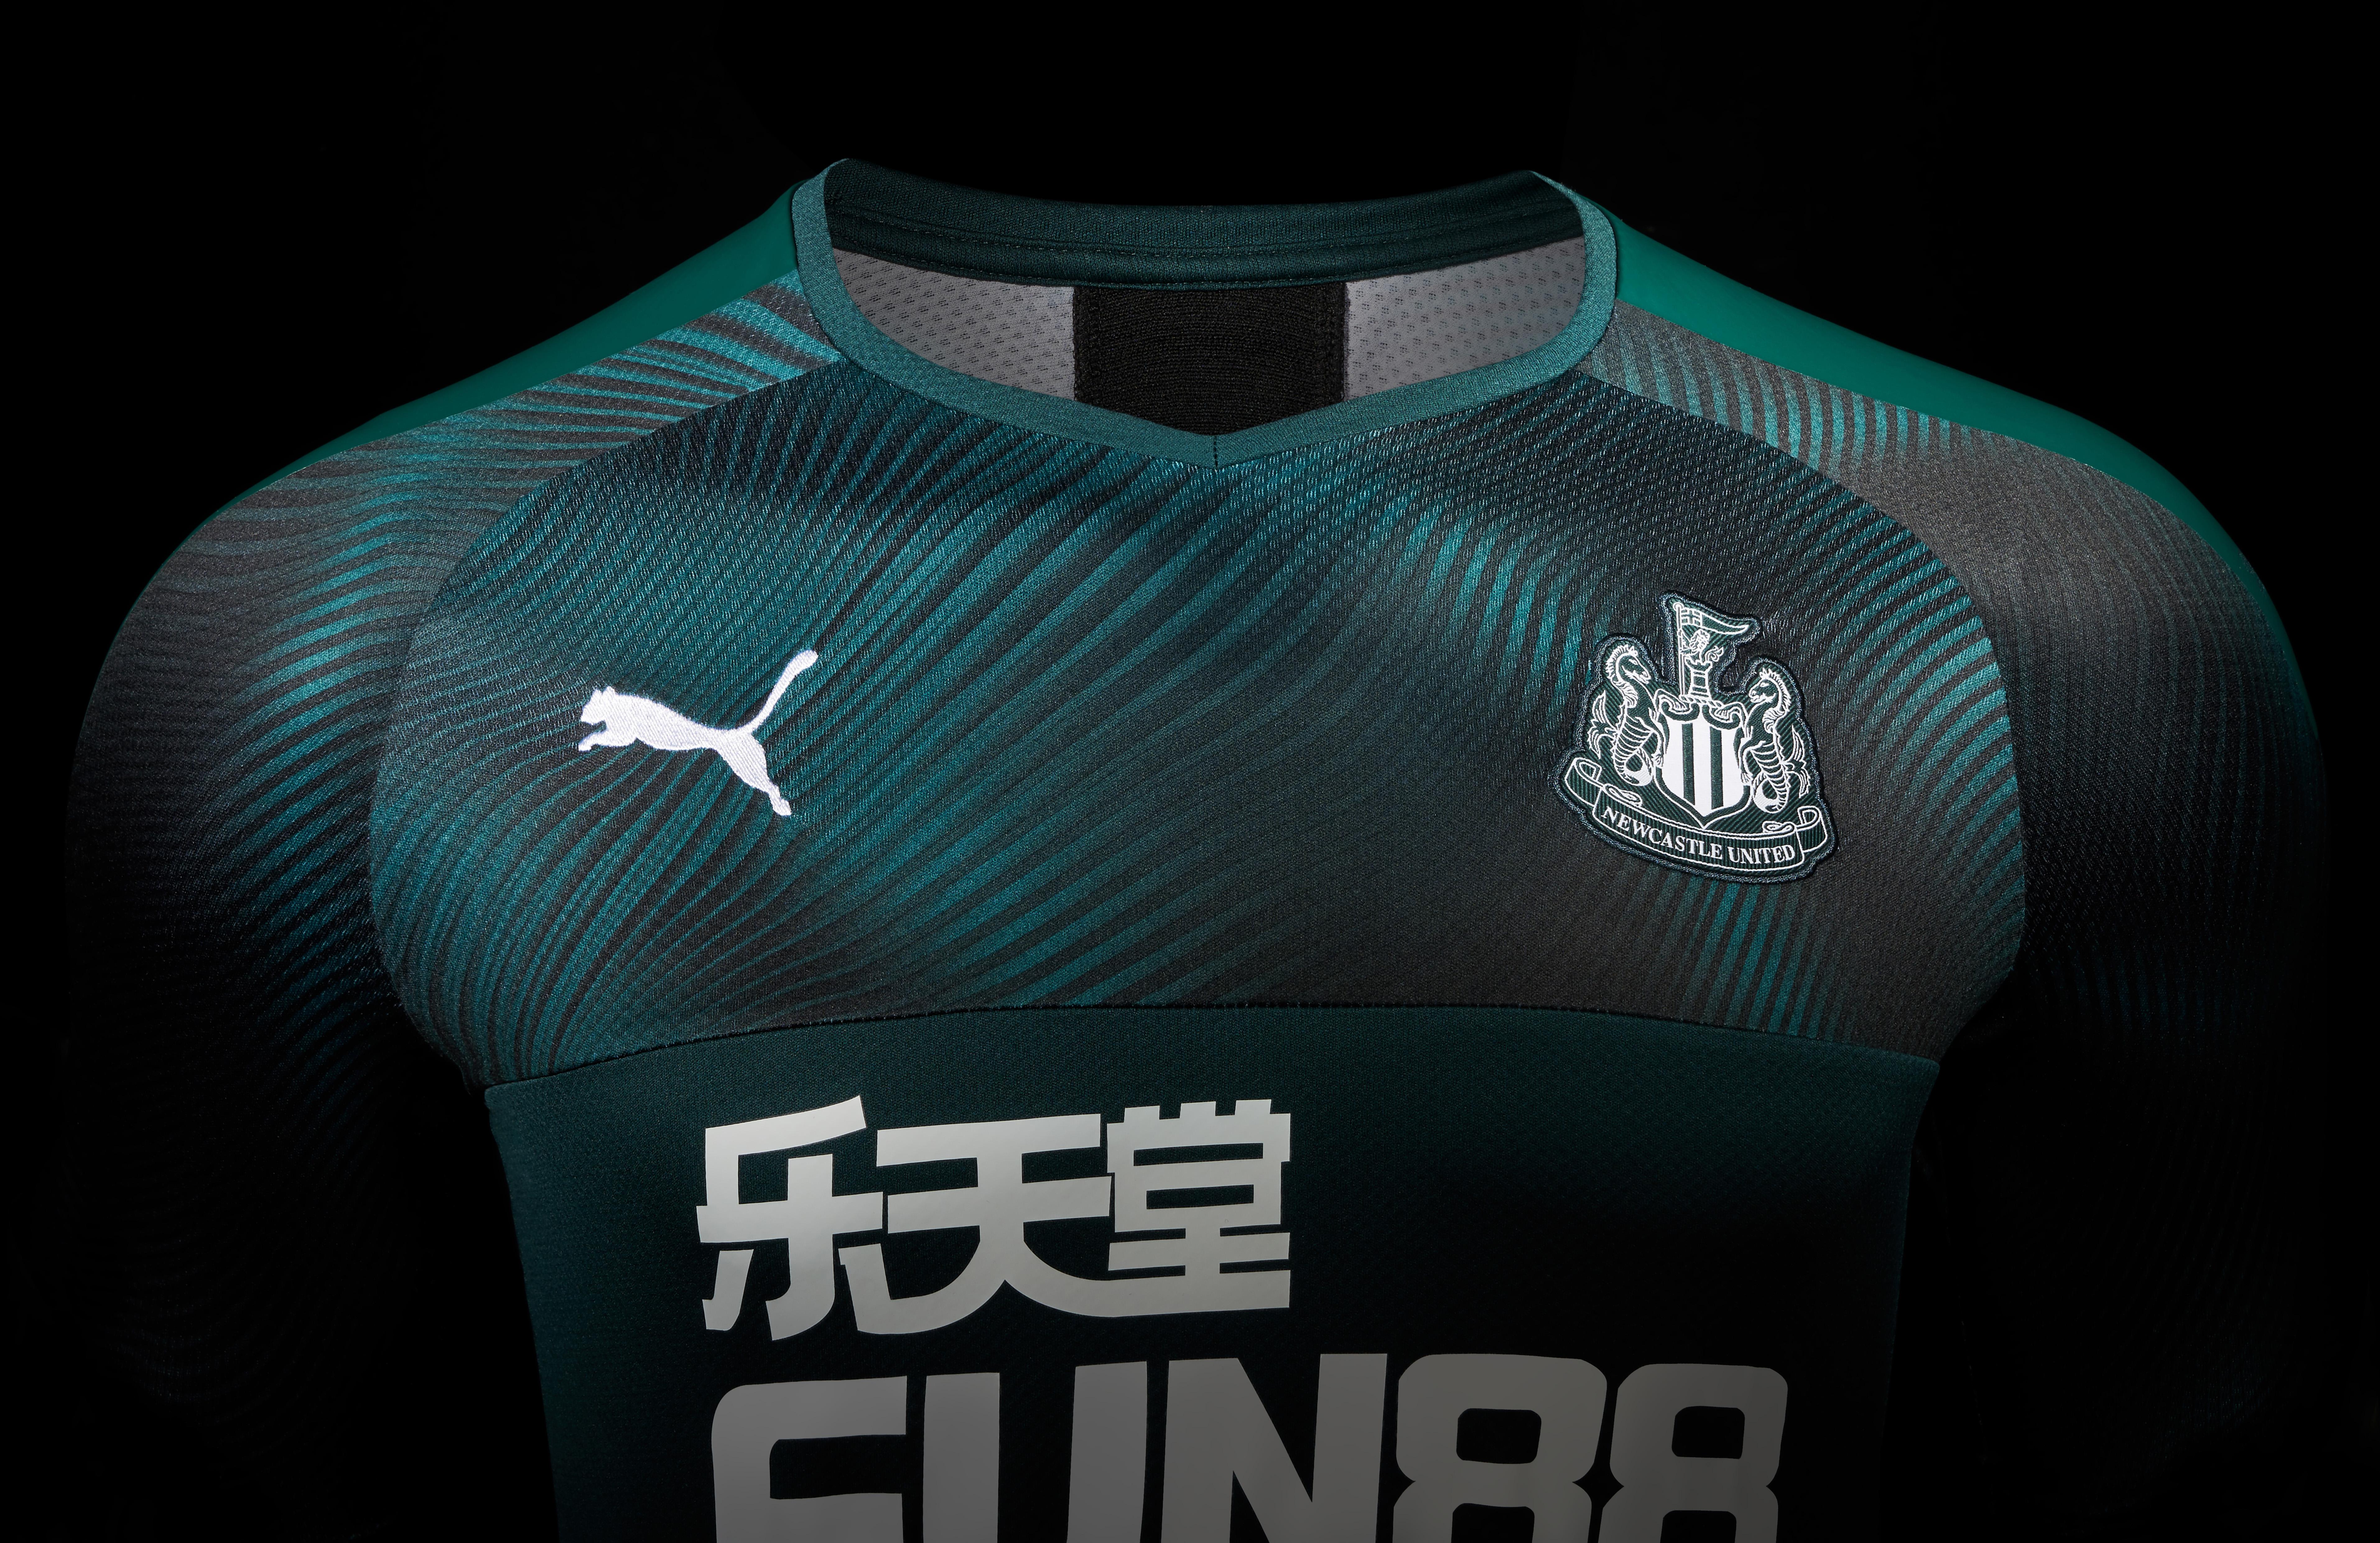 innovative design 32448 59f46 Newcastle United - New 2019/20 away kit revealed